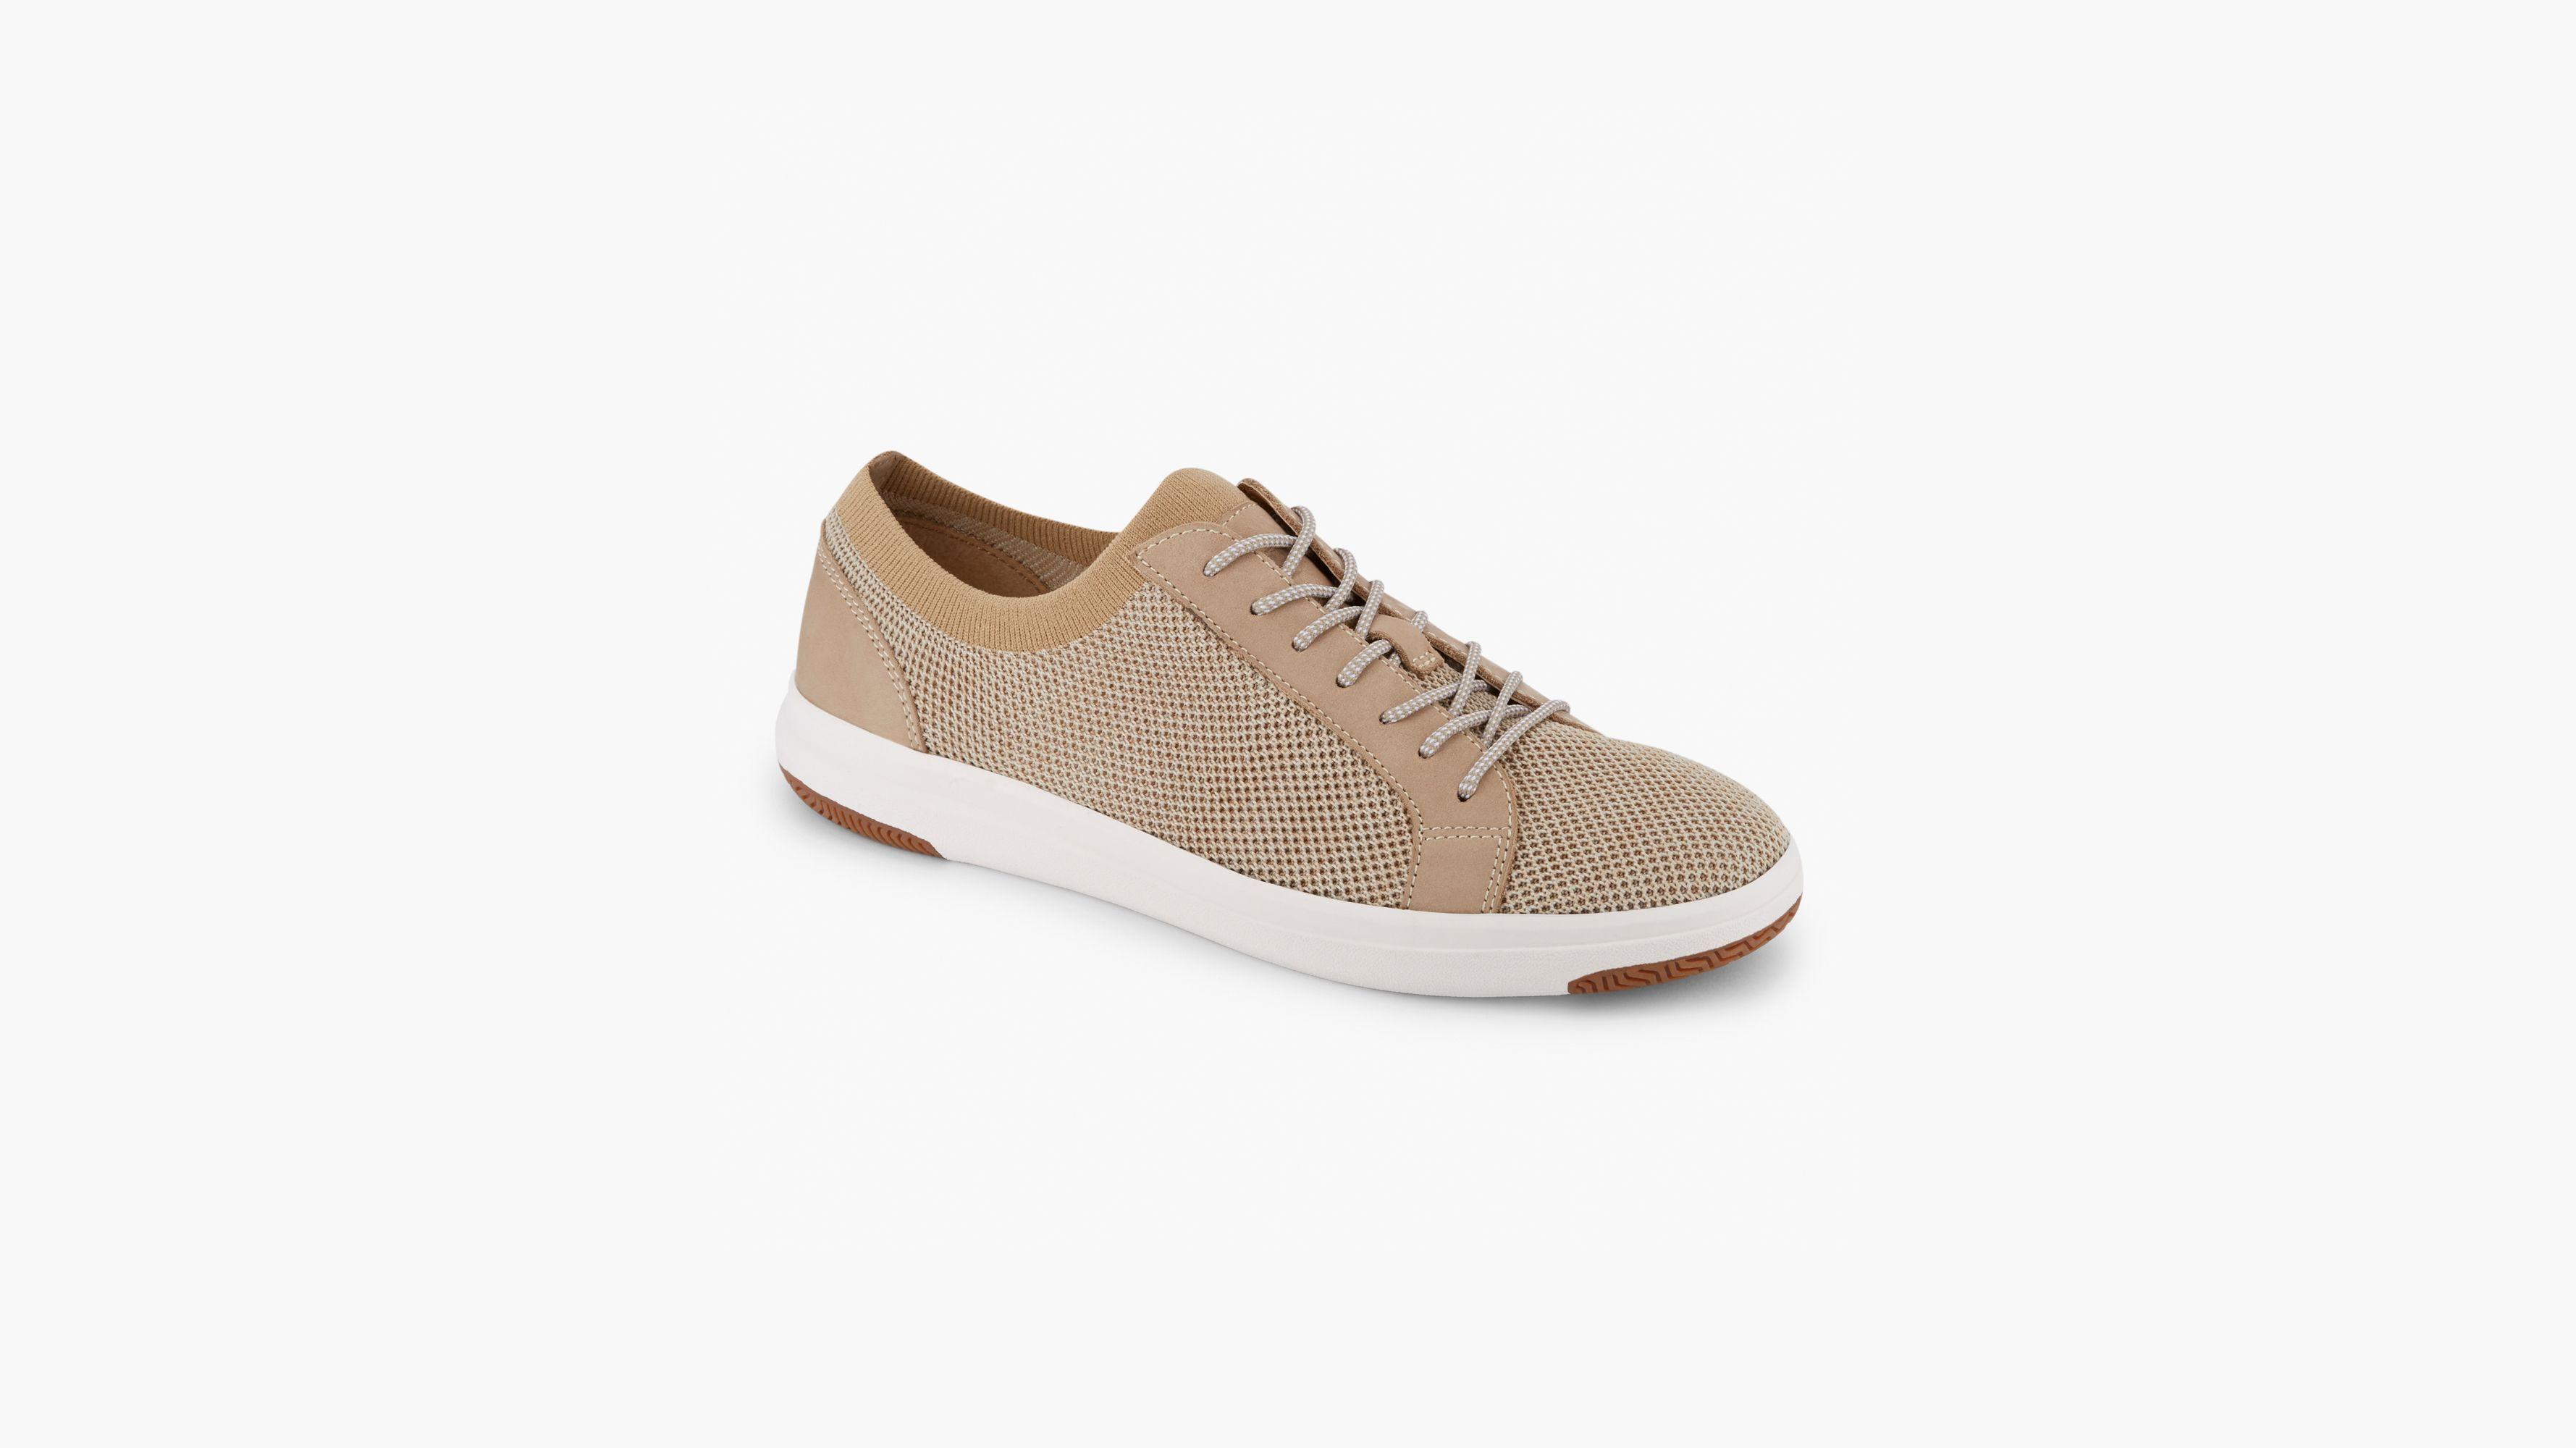 Sale ShoesDockers® Sale Sale Us Sale Us Us Us ShoesDockers® ShoesDockers® ShoesDockers® ShoesDockers® Sale Us kOnw80P